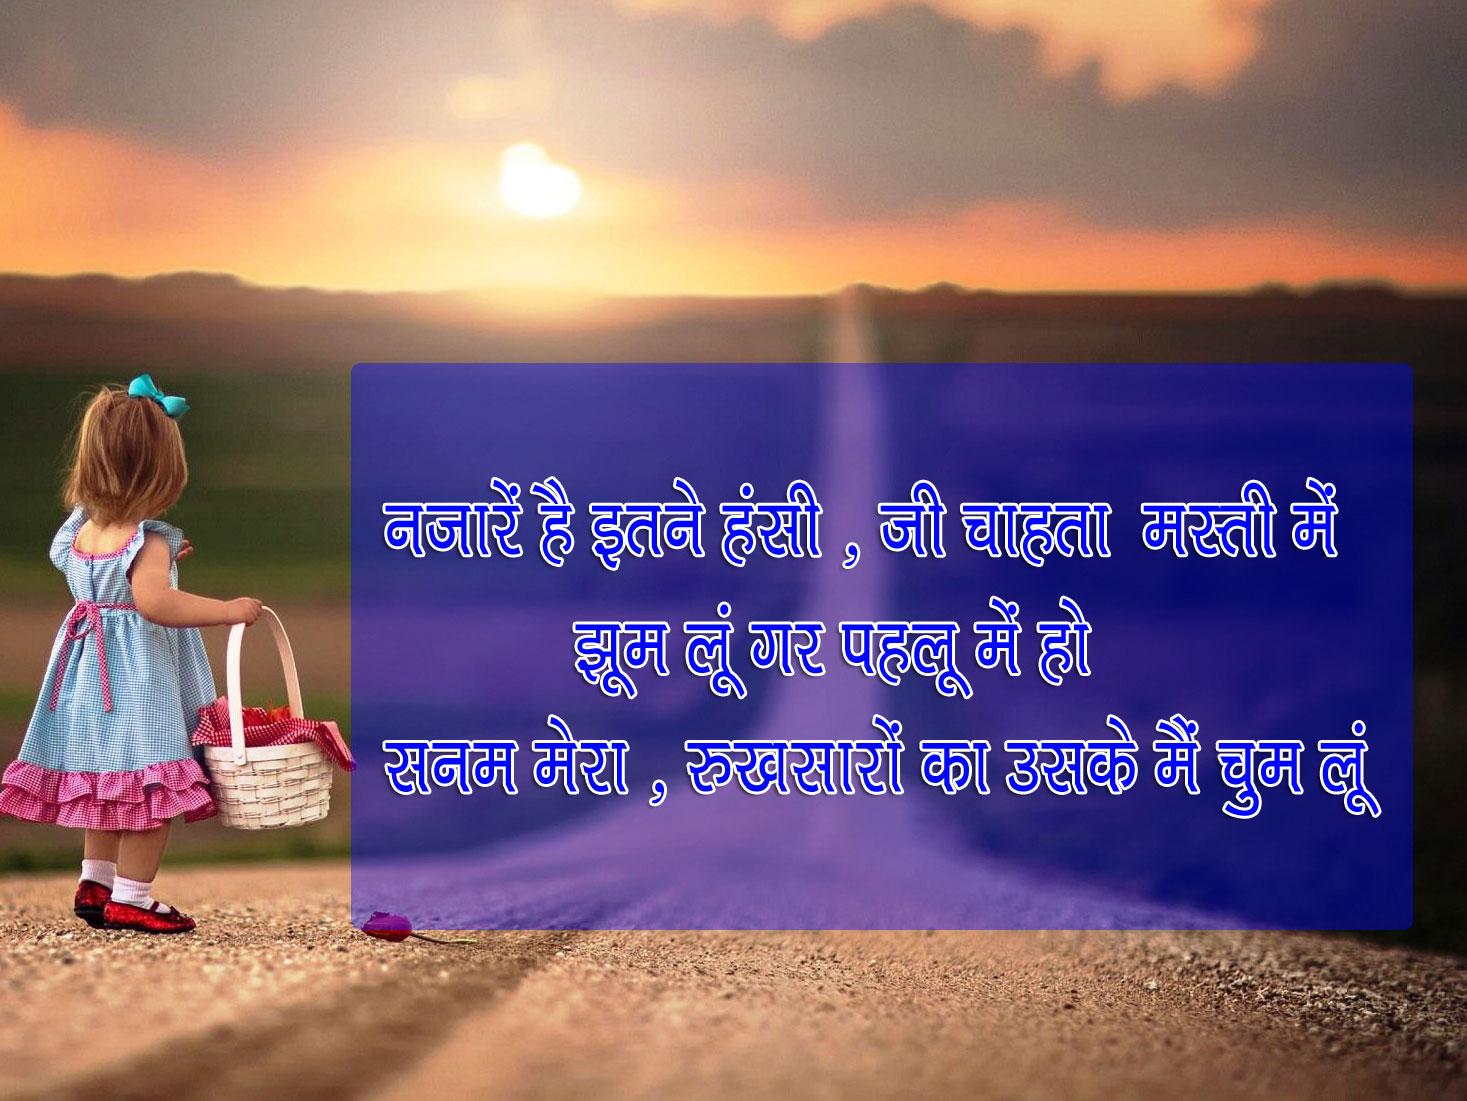 Best Hindi Shayari Images 32